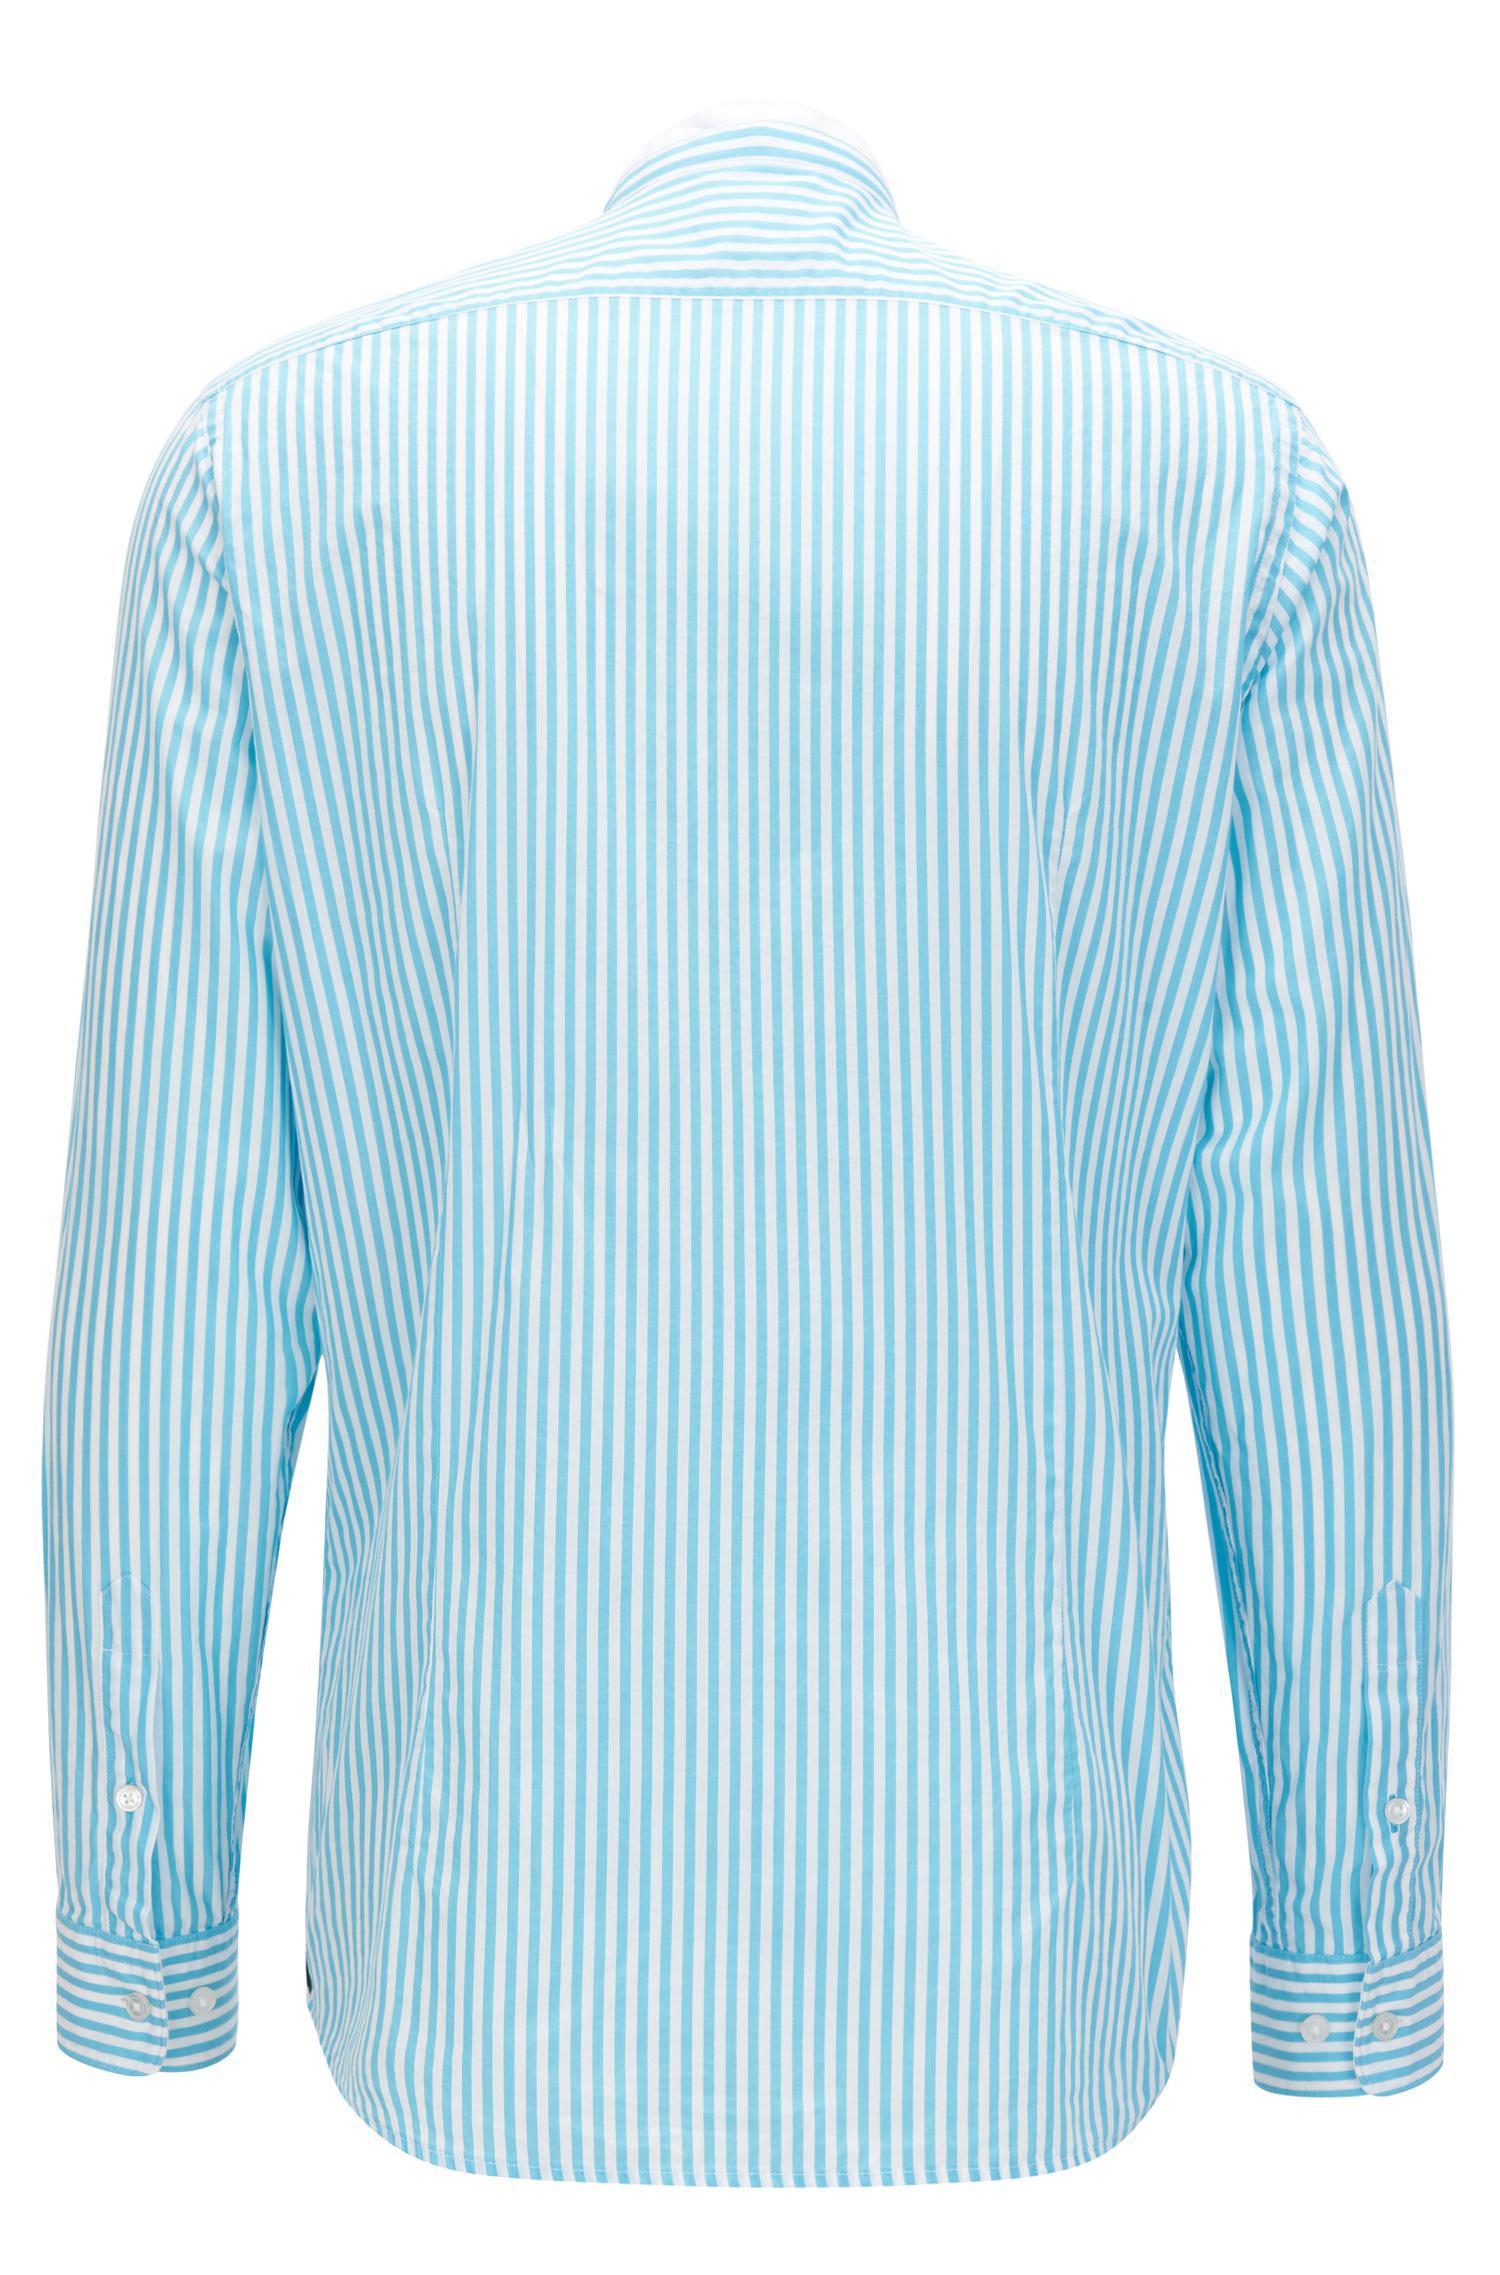 Outlet Store Sale Online Regular-fit shirt in geometric-print cotton poplin BOSS Outlet Hot Sale Cheap Sale Explore tzJEmw